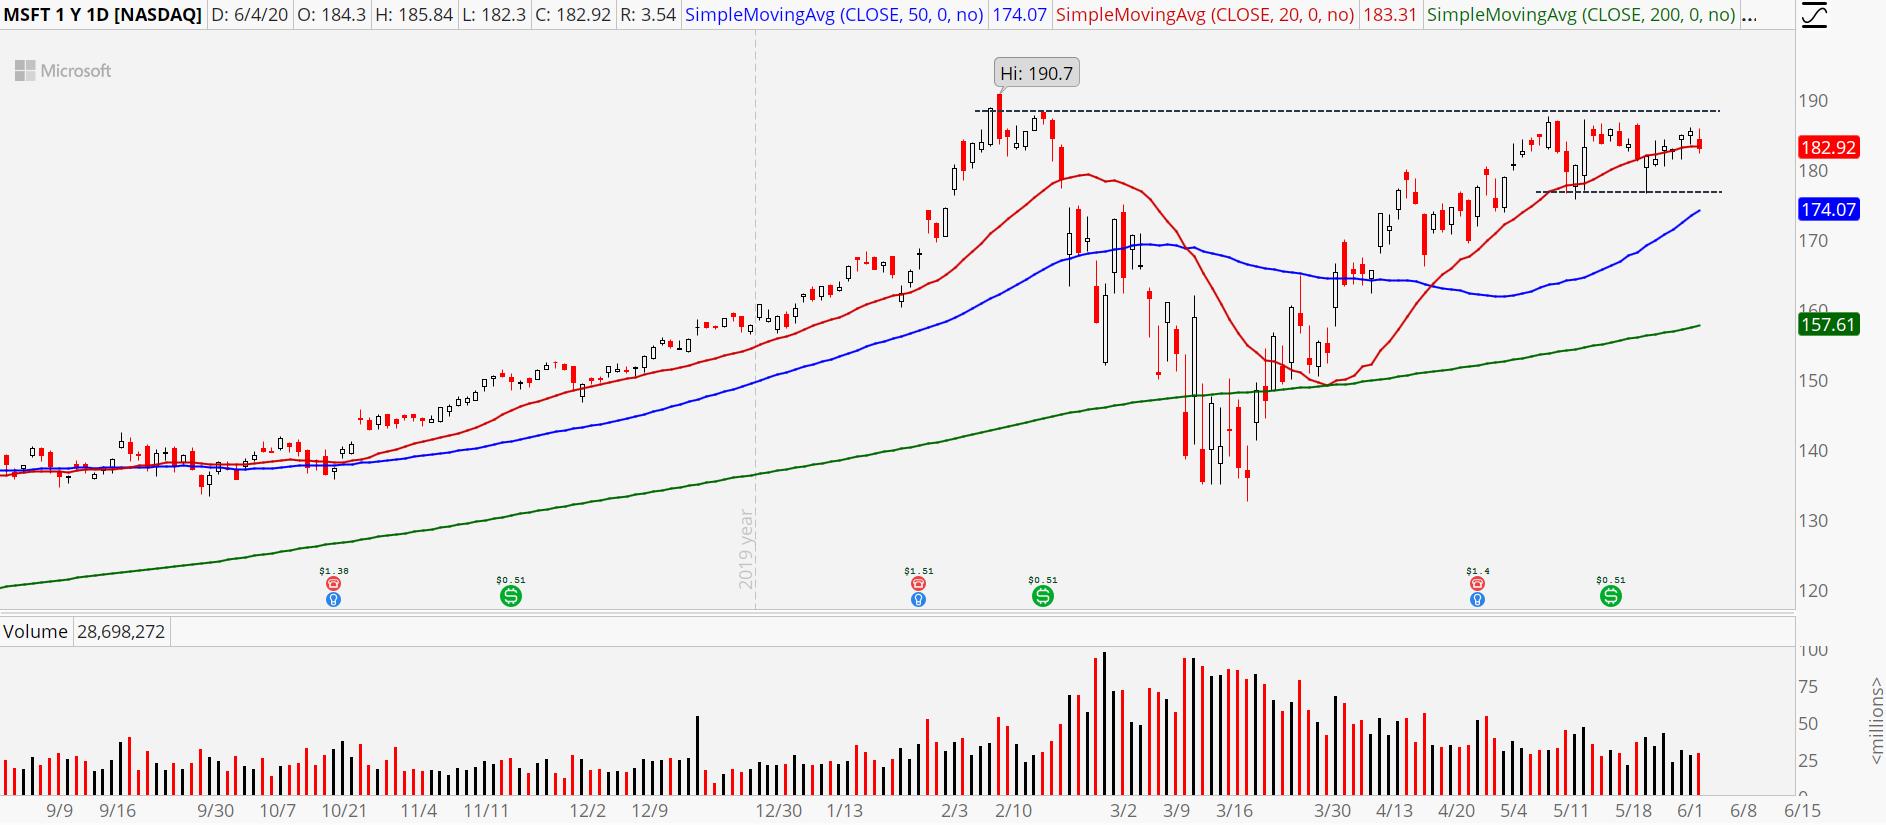 Microsoft (MSFT) stock